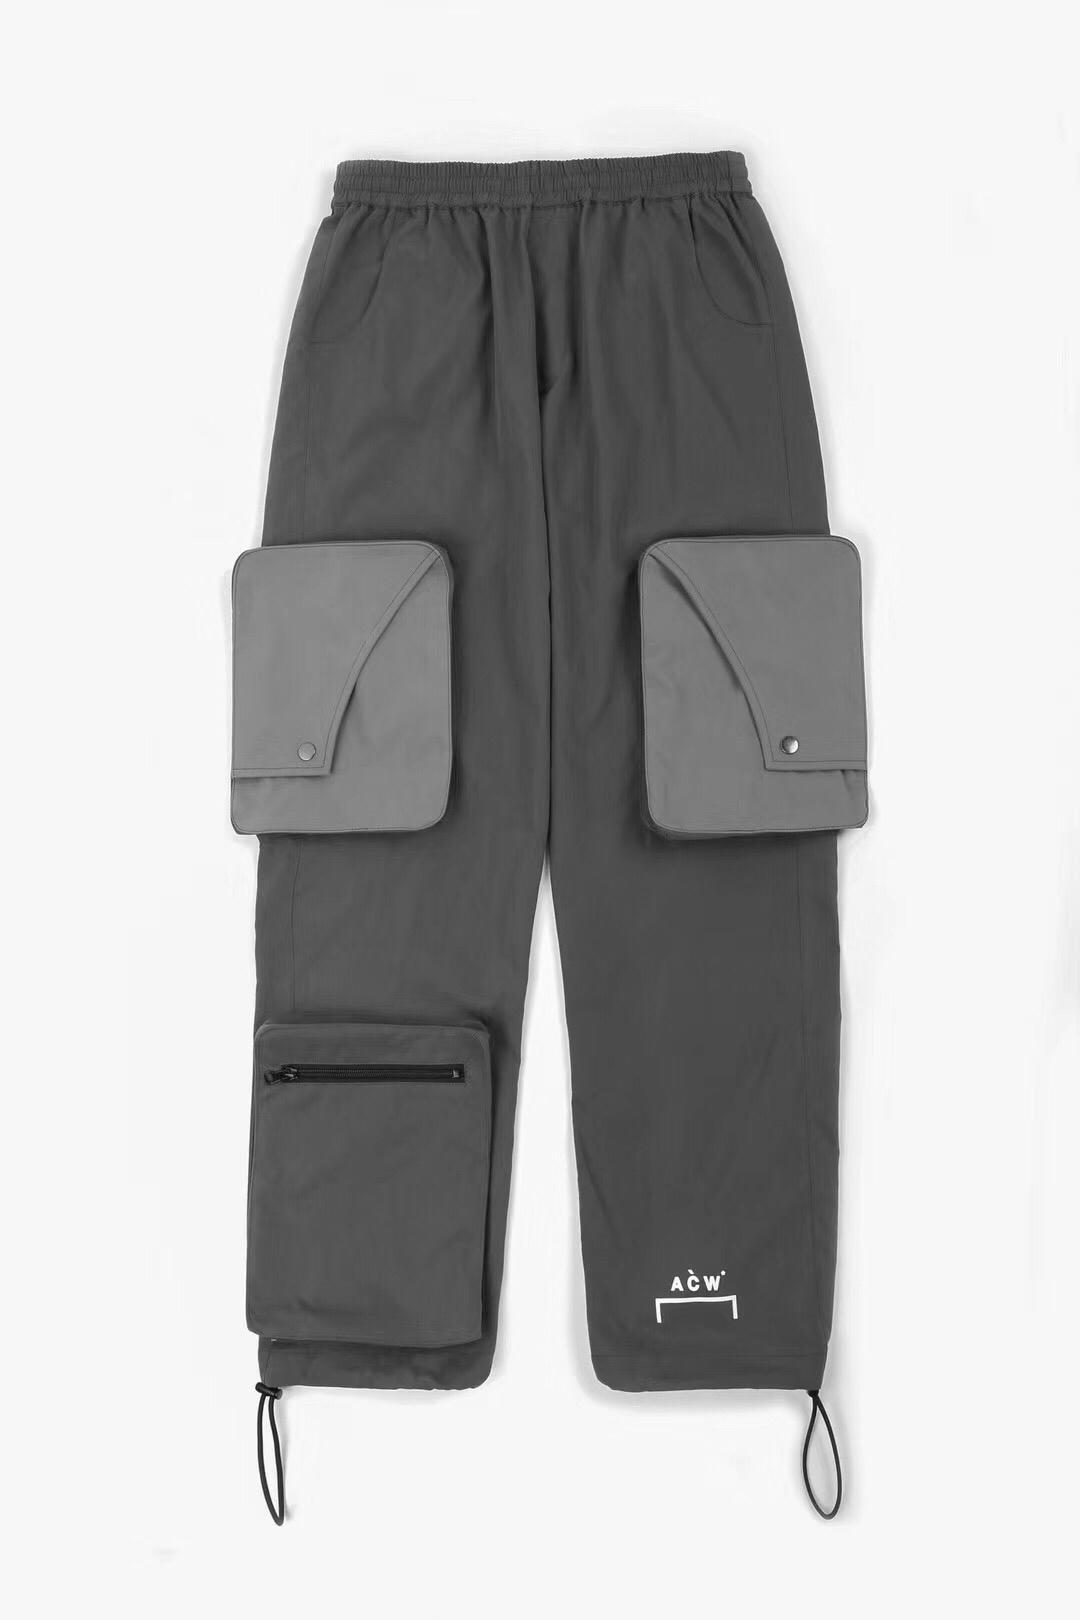 19ss Acw Cargo pantalon poche A froid mur pantalon hommes femmes Hip Hop Streetwear Acw cordon Streetwear Joggers A-COLD-WALL pantalon